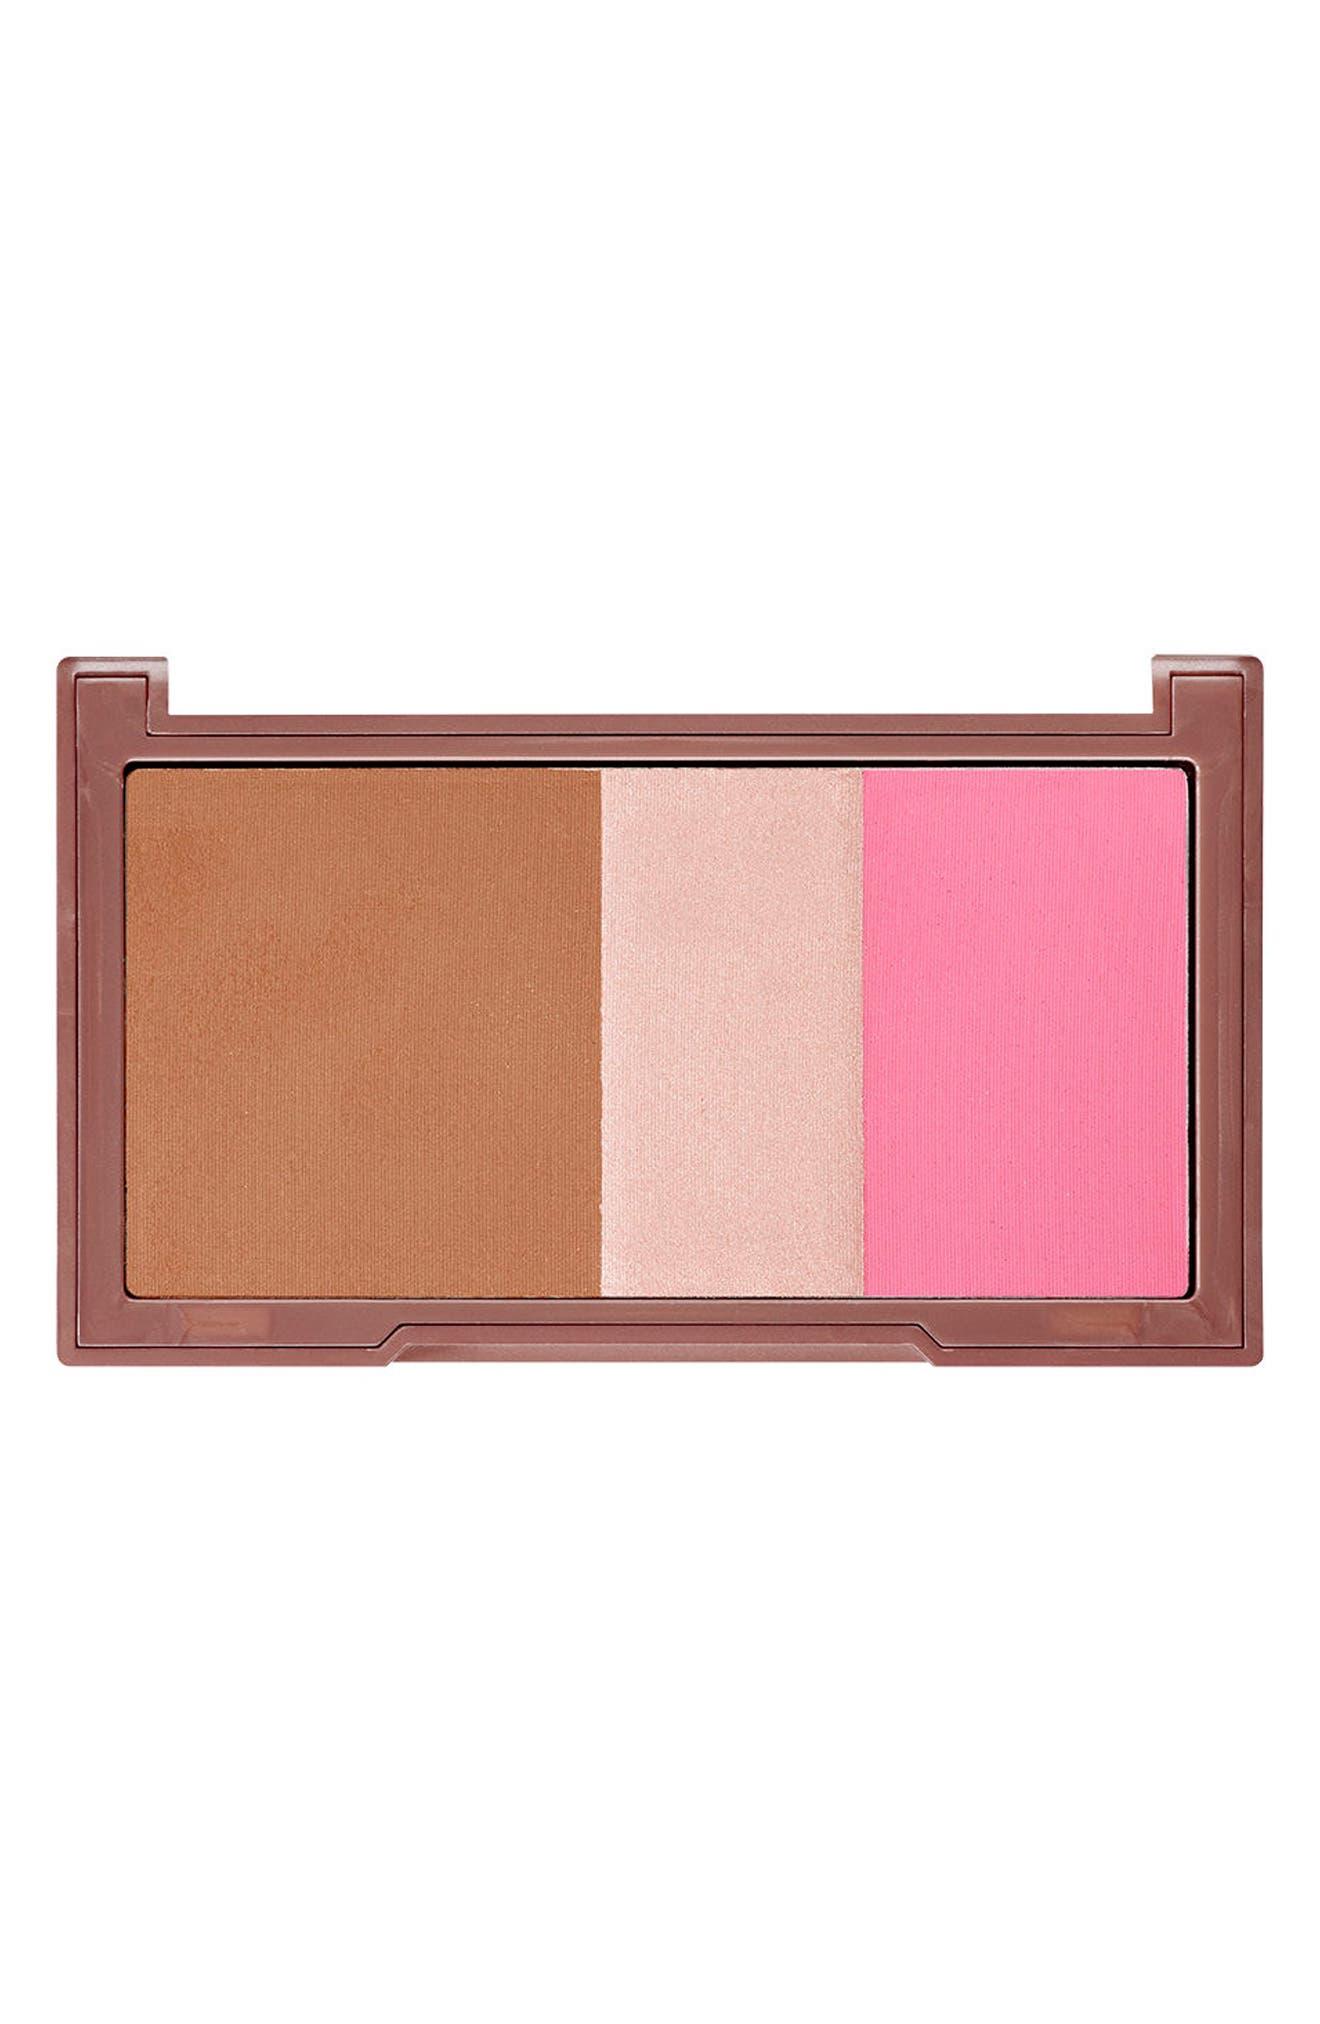 Naked Flushed Bronzer, Highlighter & Blush Palette,                             Main thumbnail 1, color,                             Going Native